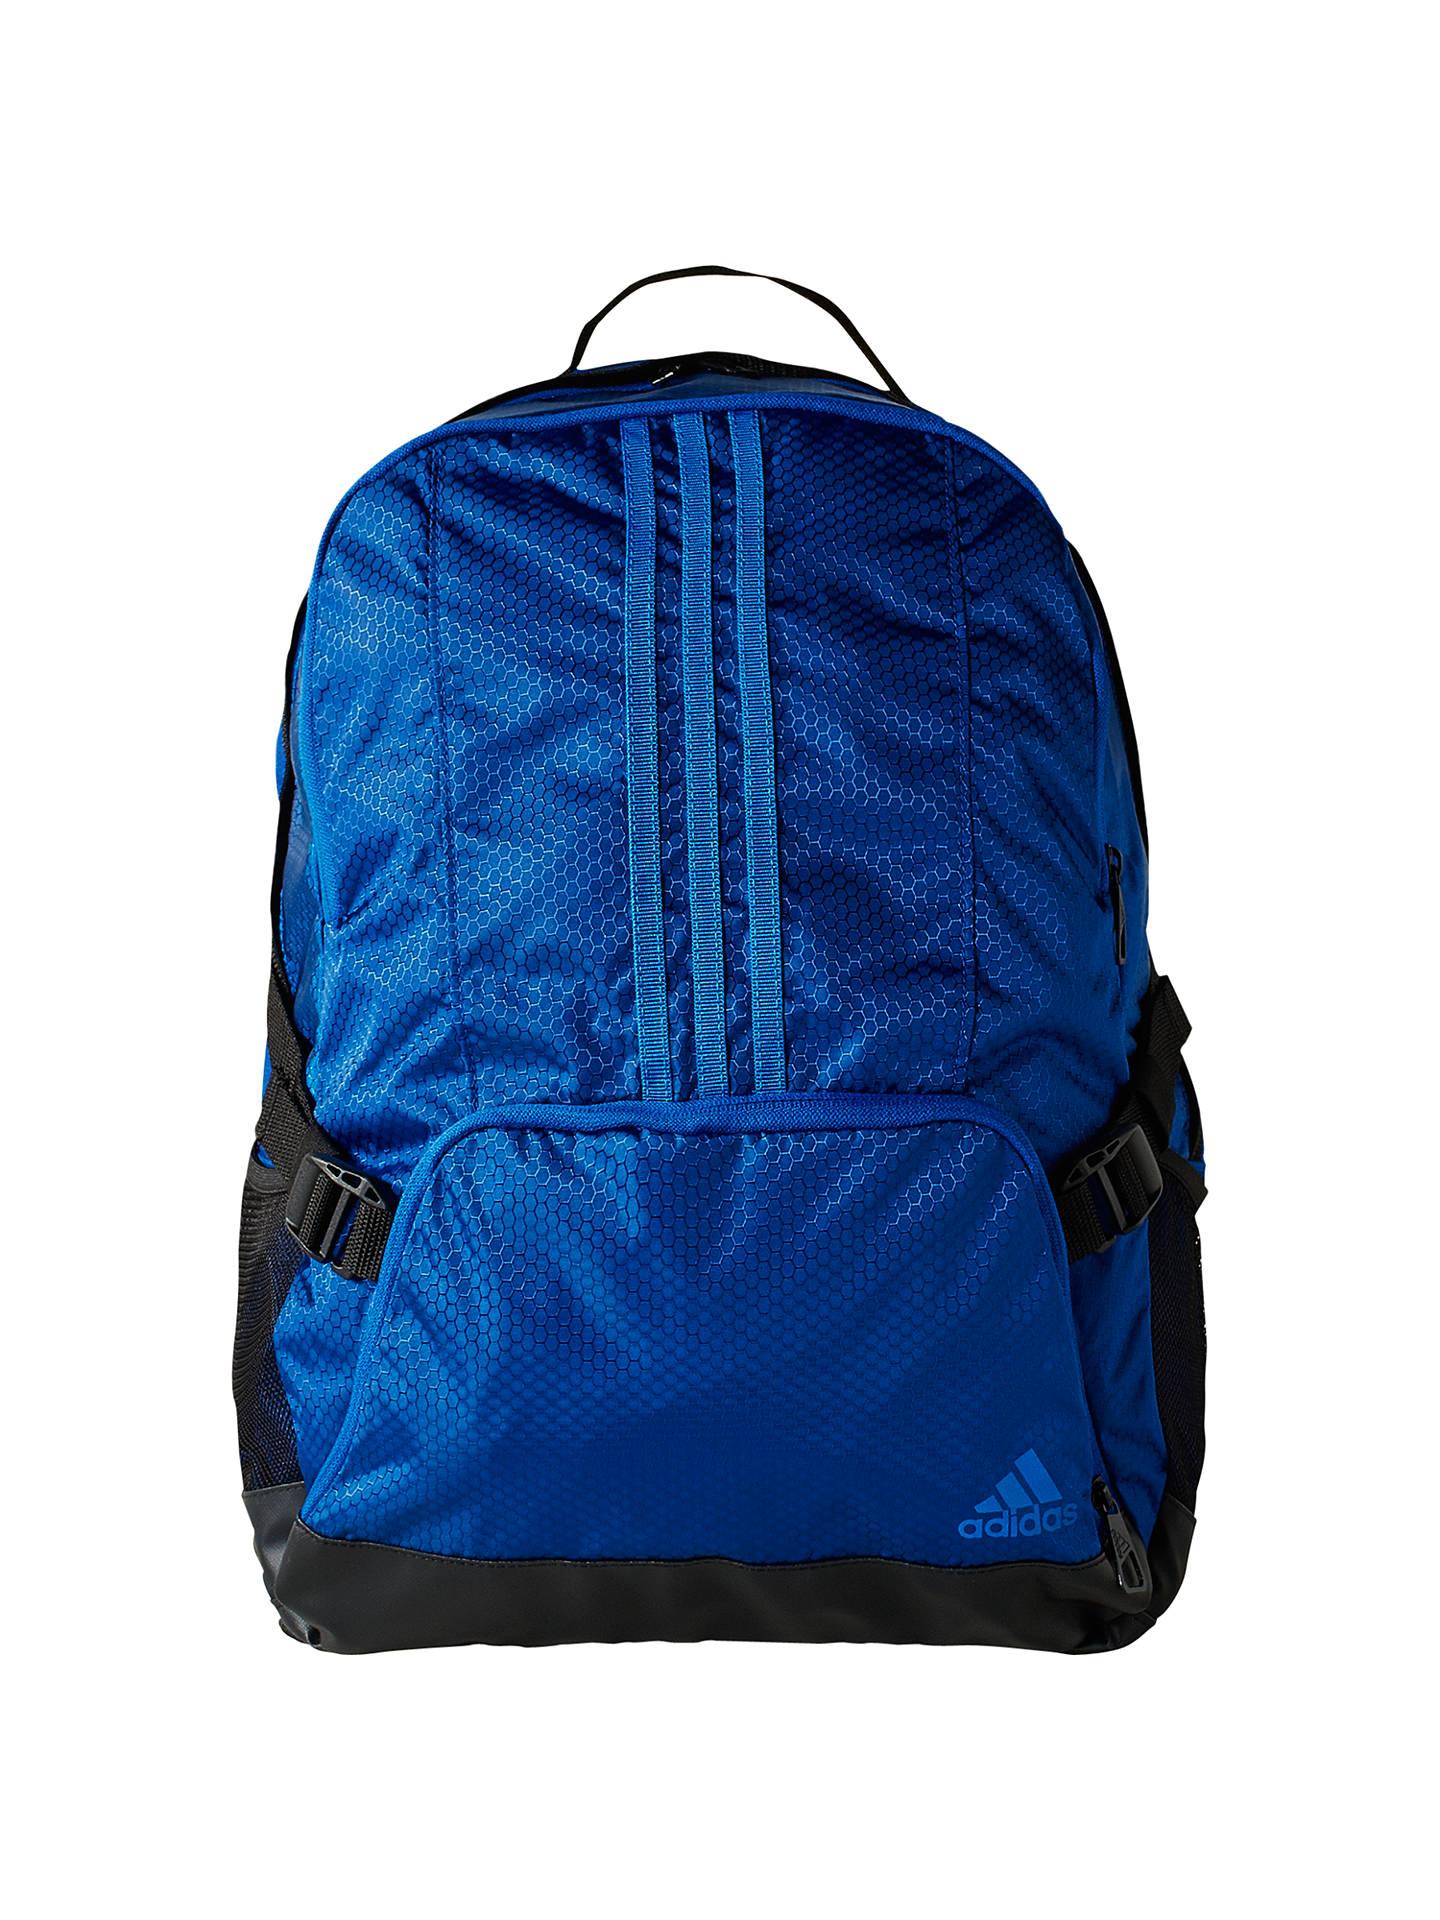 Adidas 3 Stripes Performance Sports Backpack at John Lewis   Partners 13cda6cd48cd5